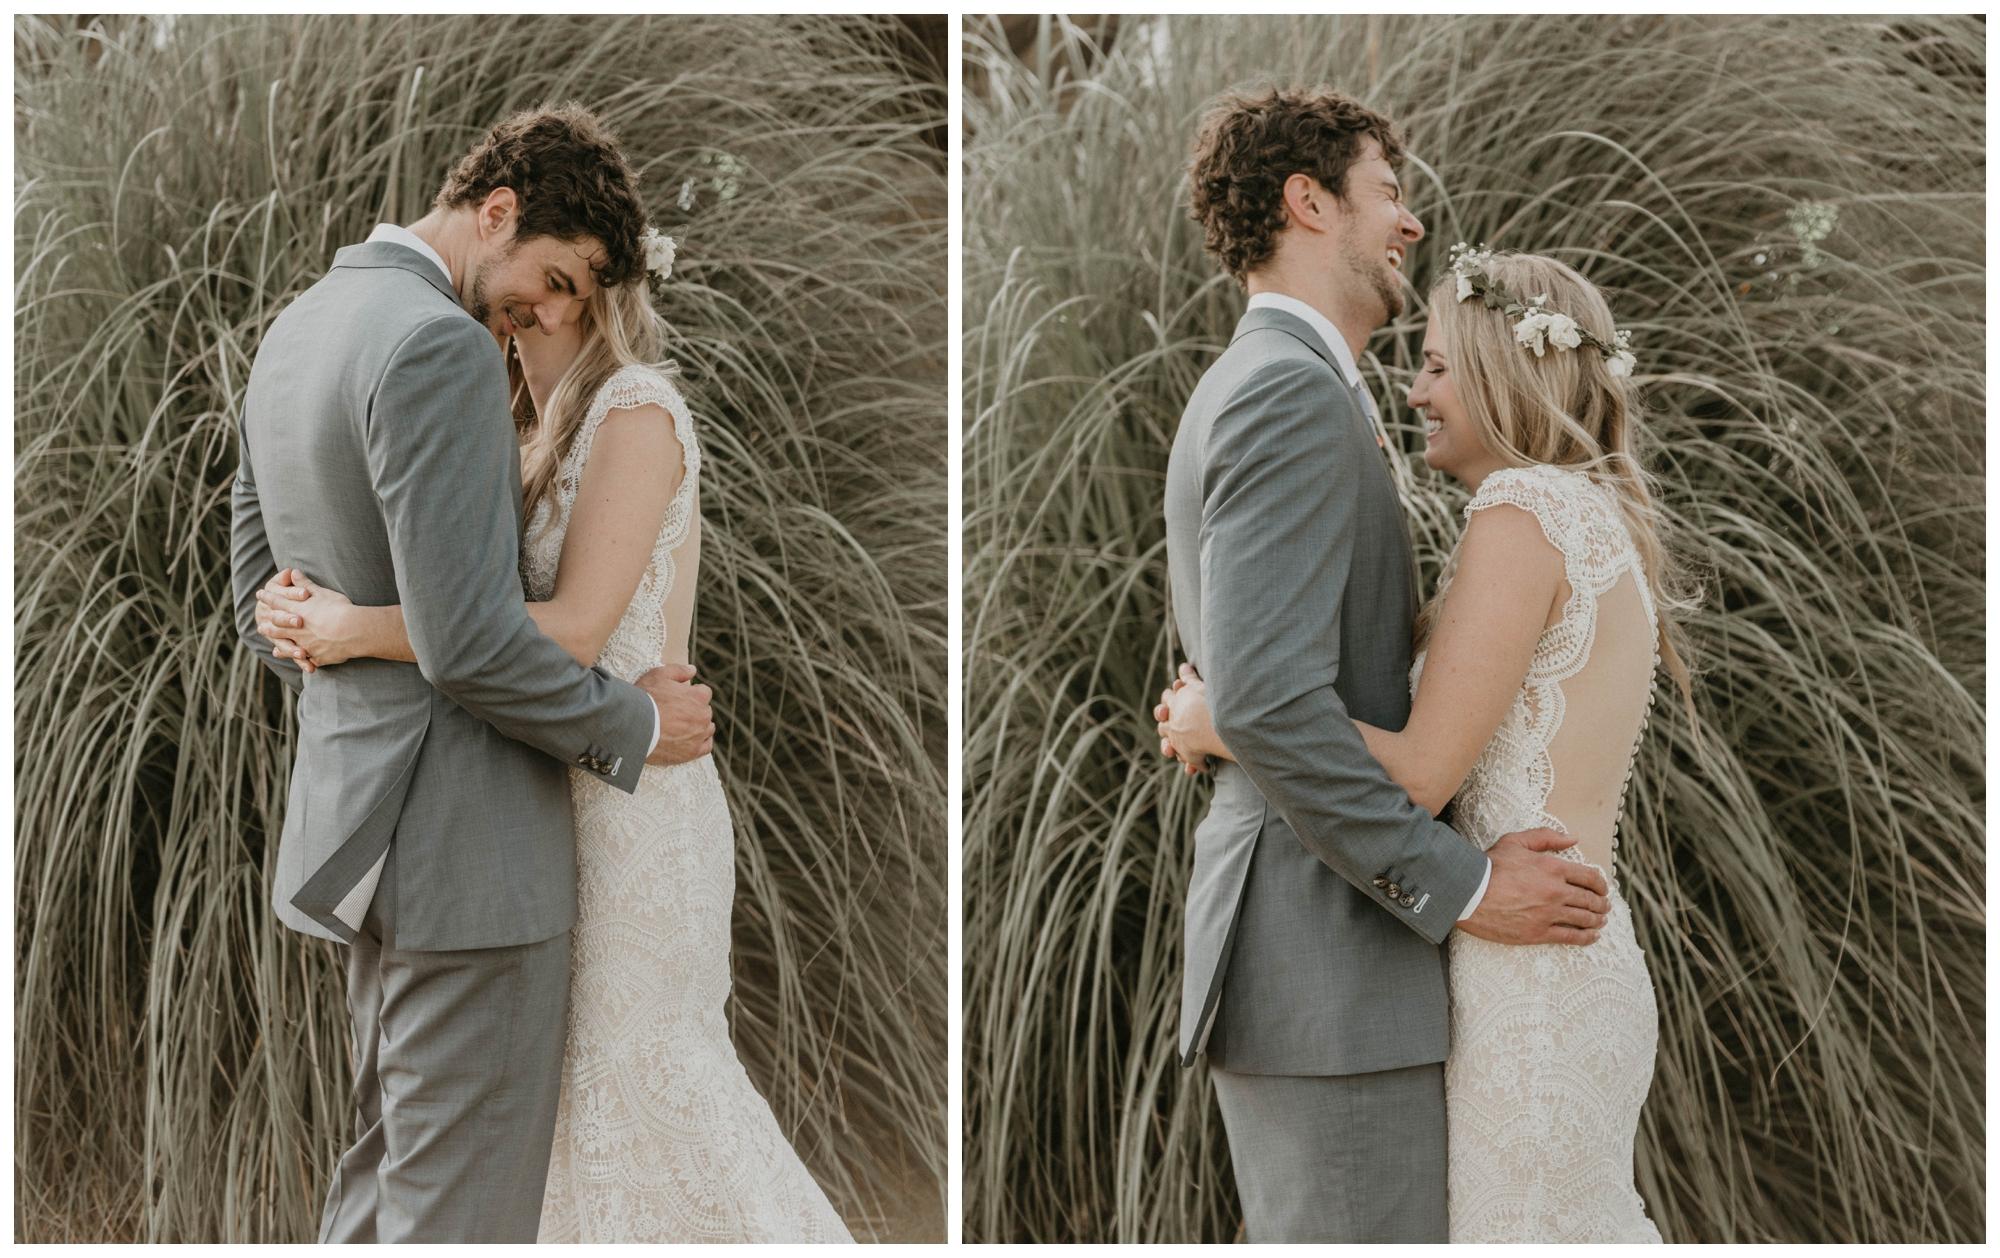 austin-texas-wedding-photography-1778-photographie_0100.jpg